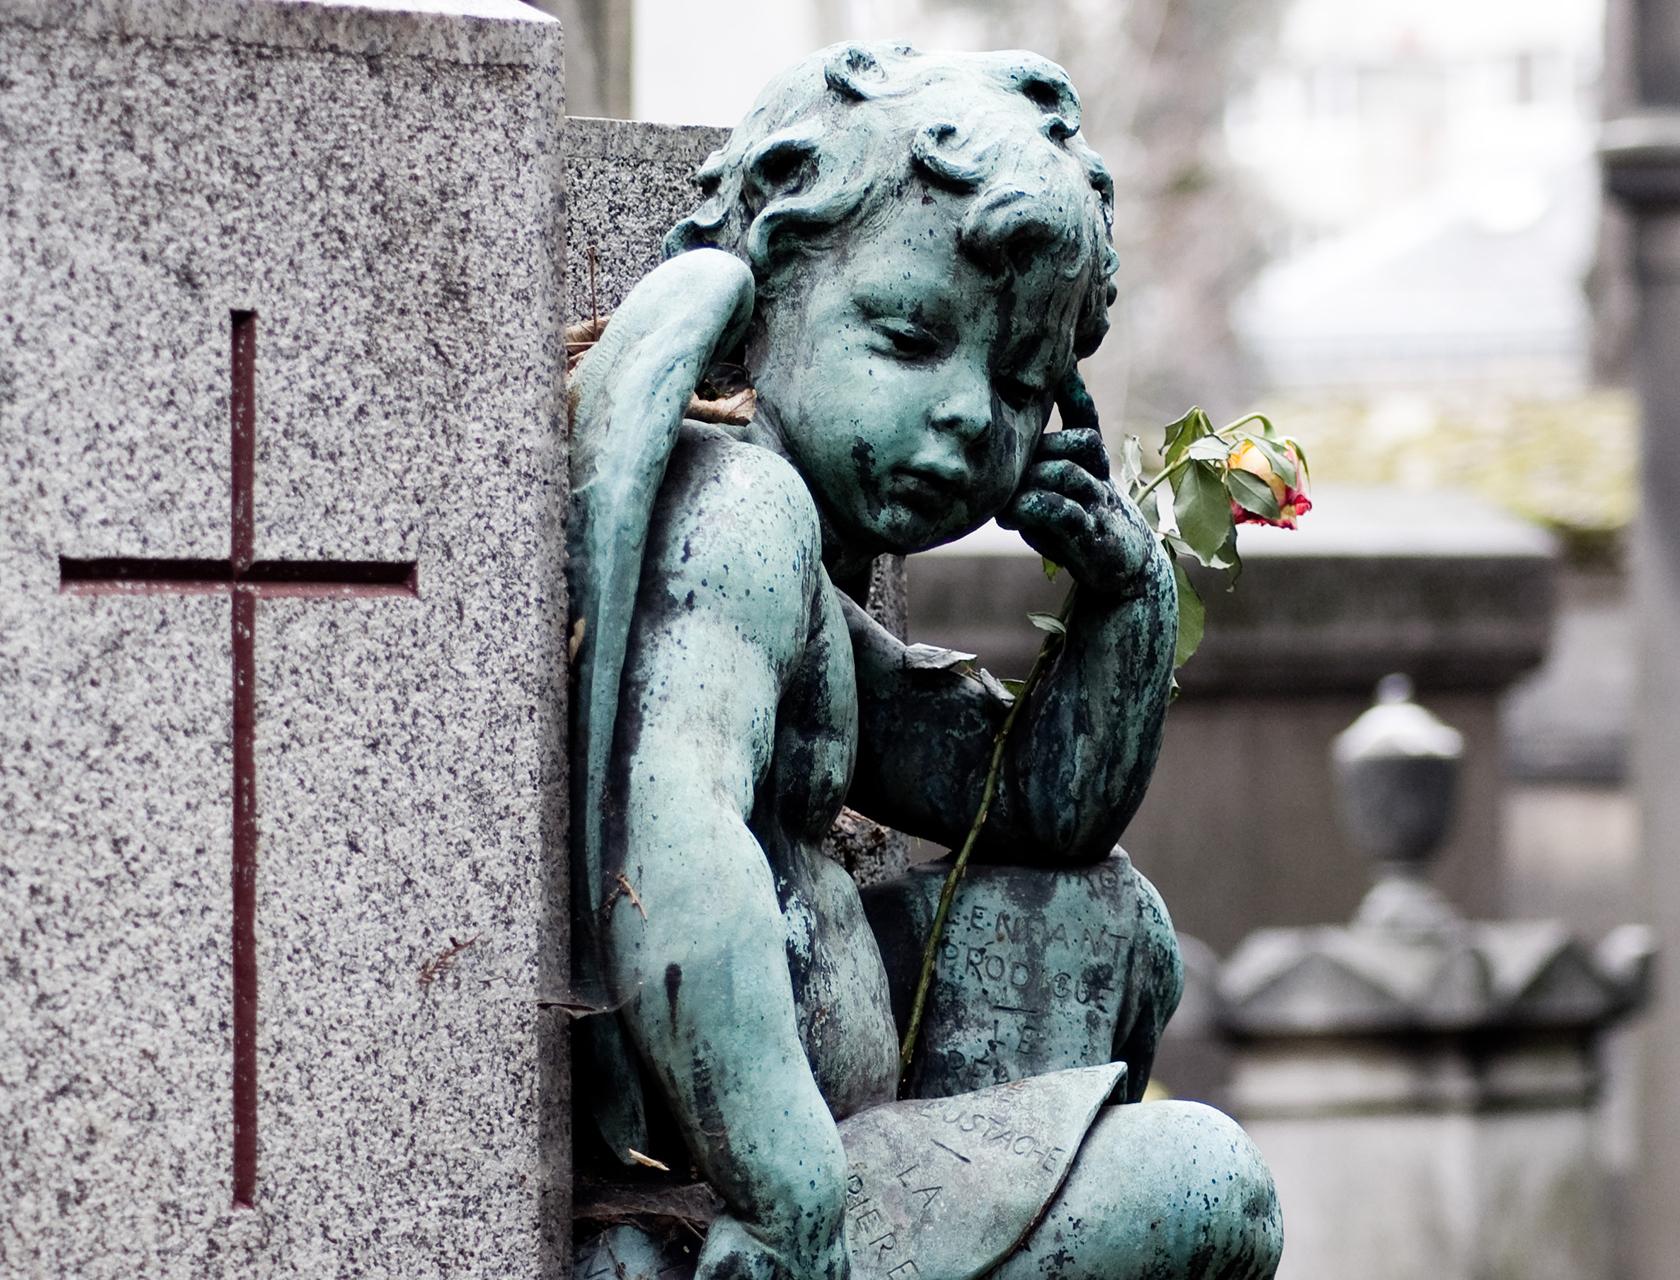 Cherub statue in Père Lachaise Cemetery in Paris